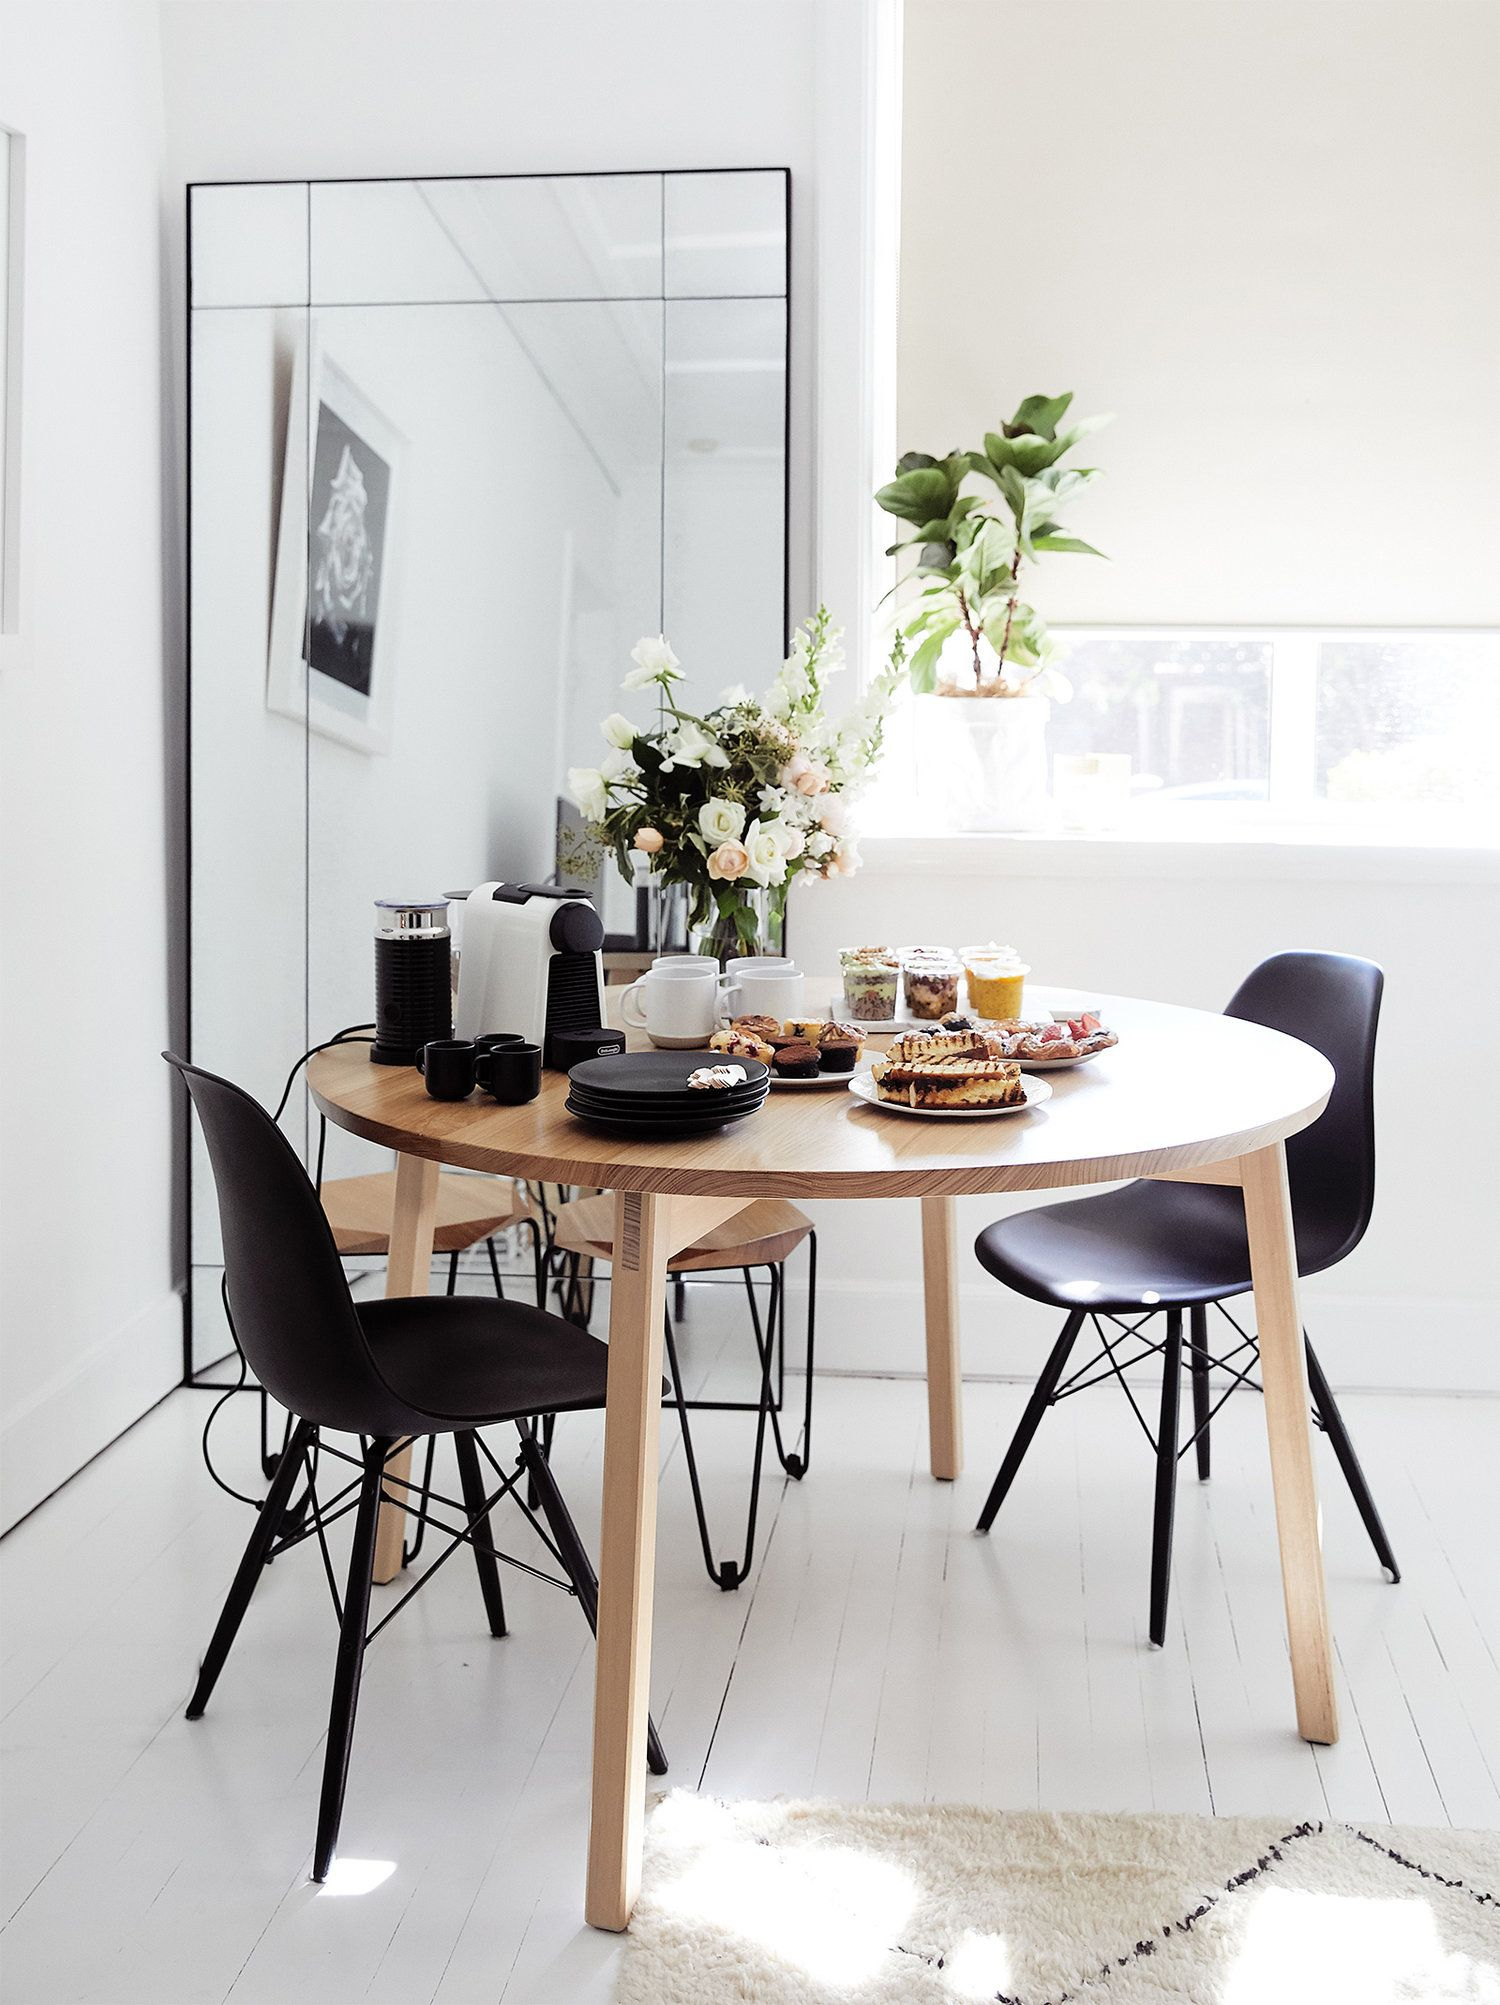 Perfect Brunch Set Up Minimalist Dining Room Table Minimalist